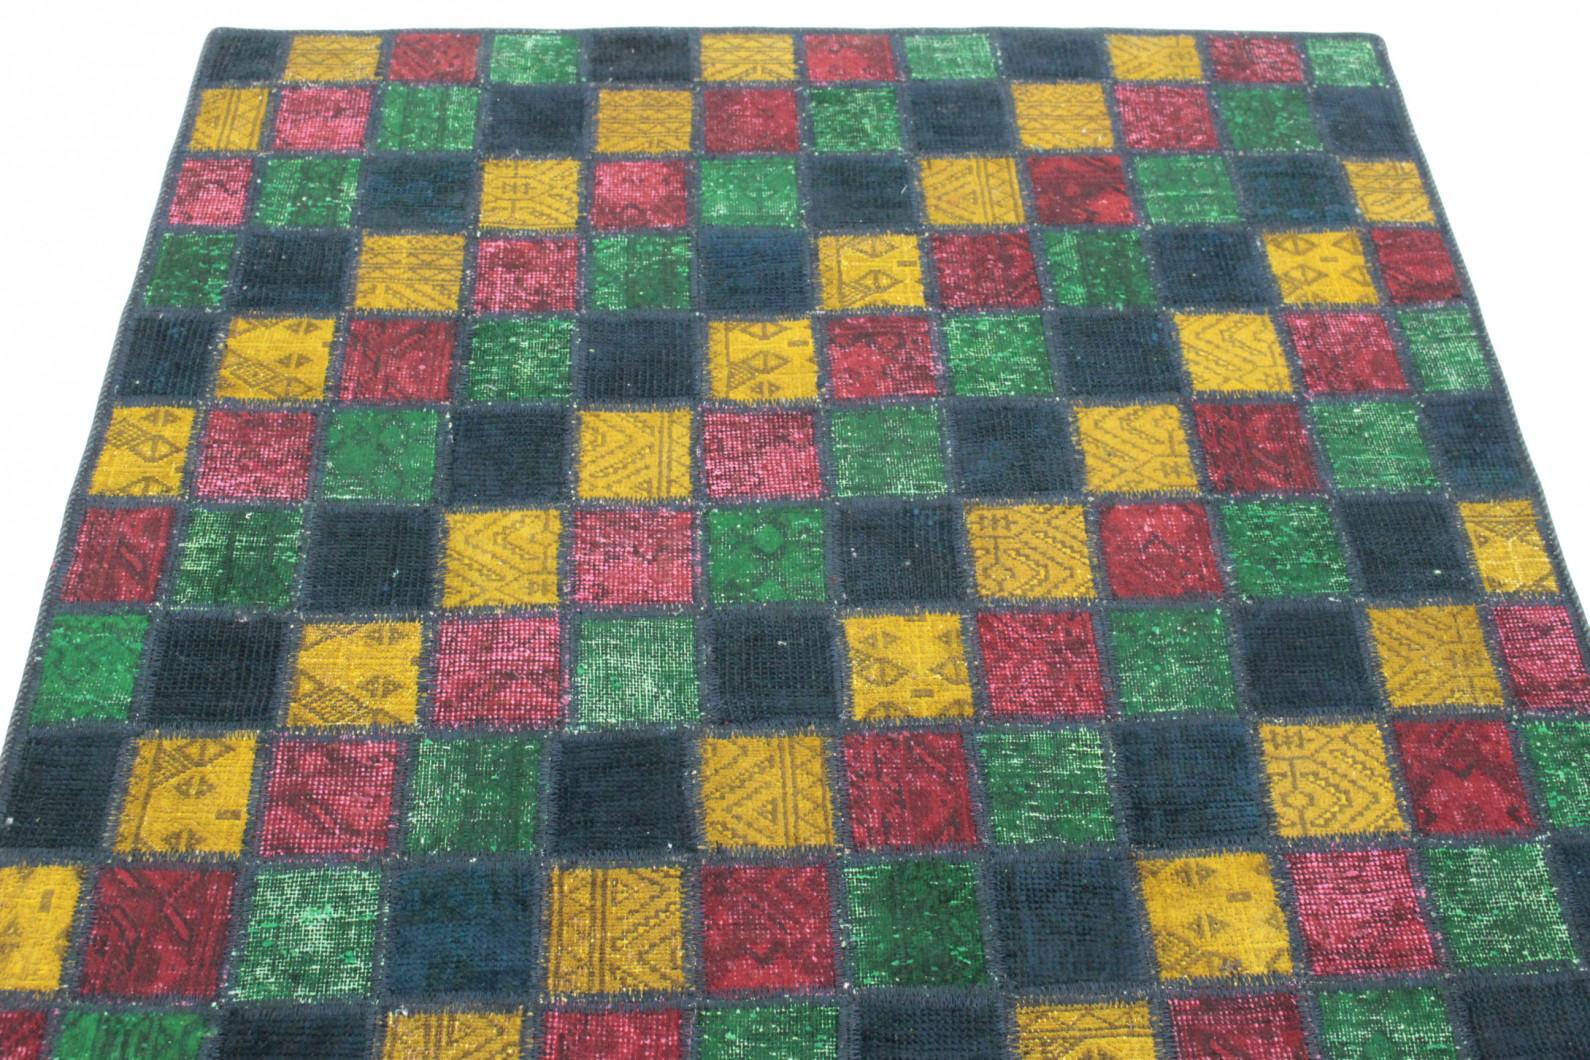 patchwork teppich blau gr n gelb rot in 210x130 1001. Black Bedroom Furniture Sets. Home Design Ideas